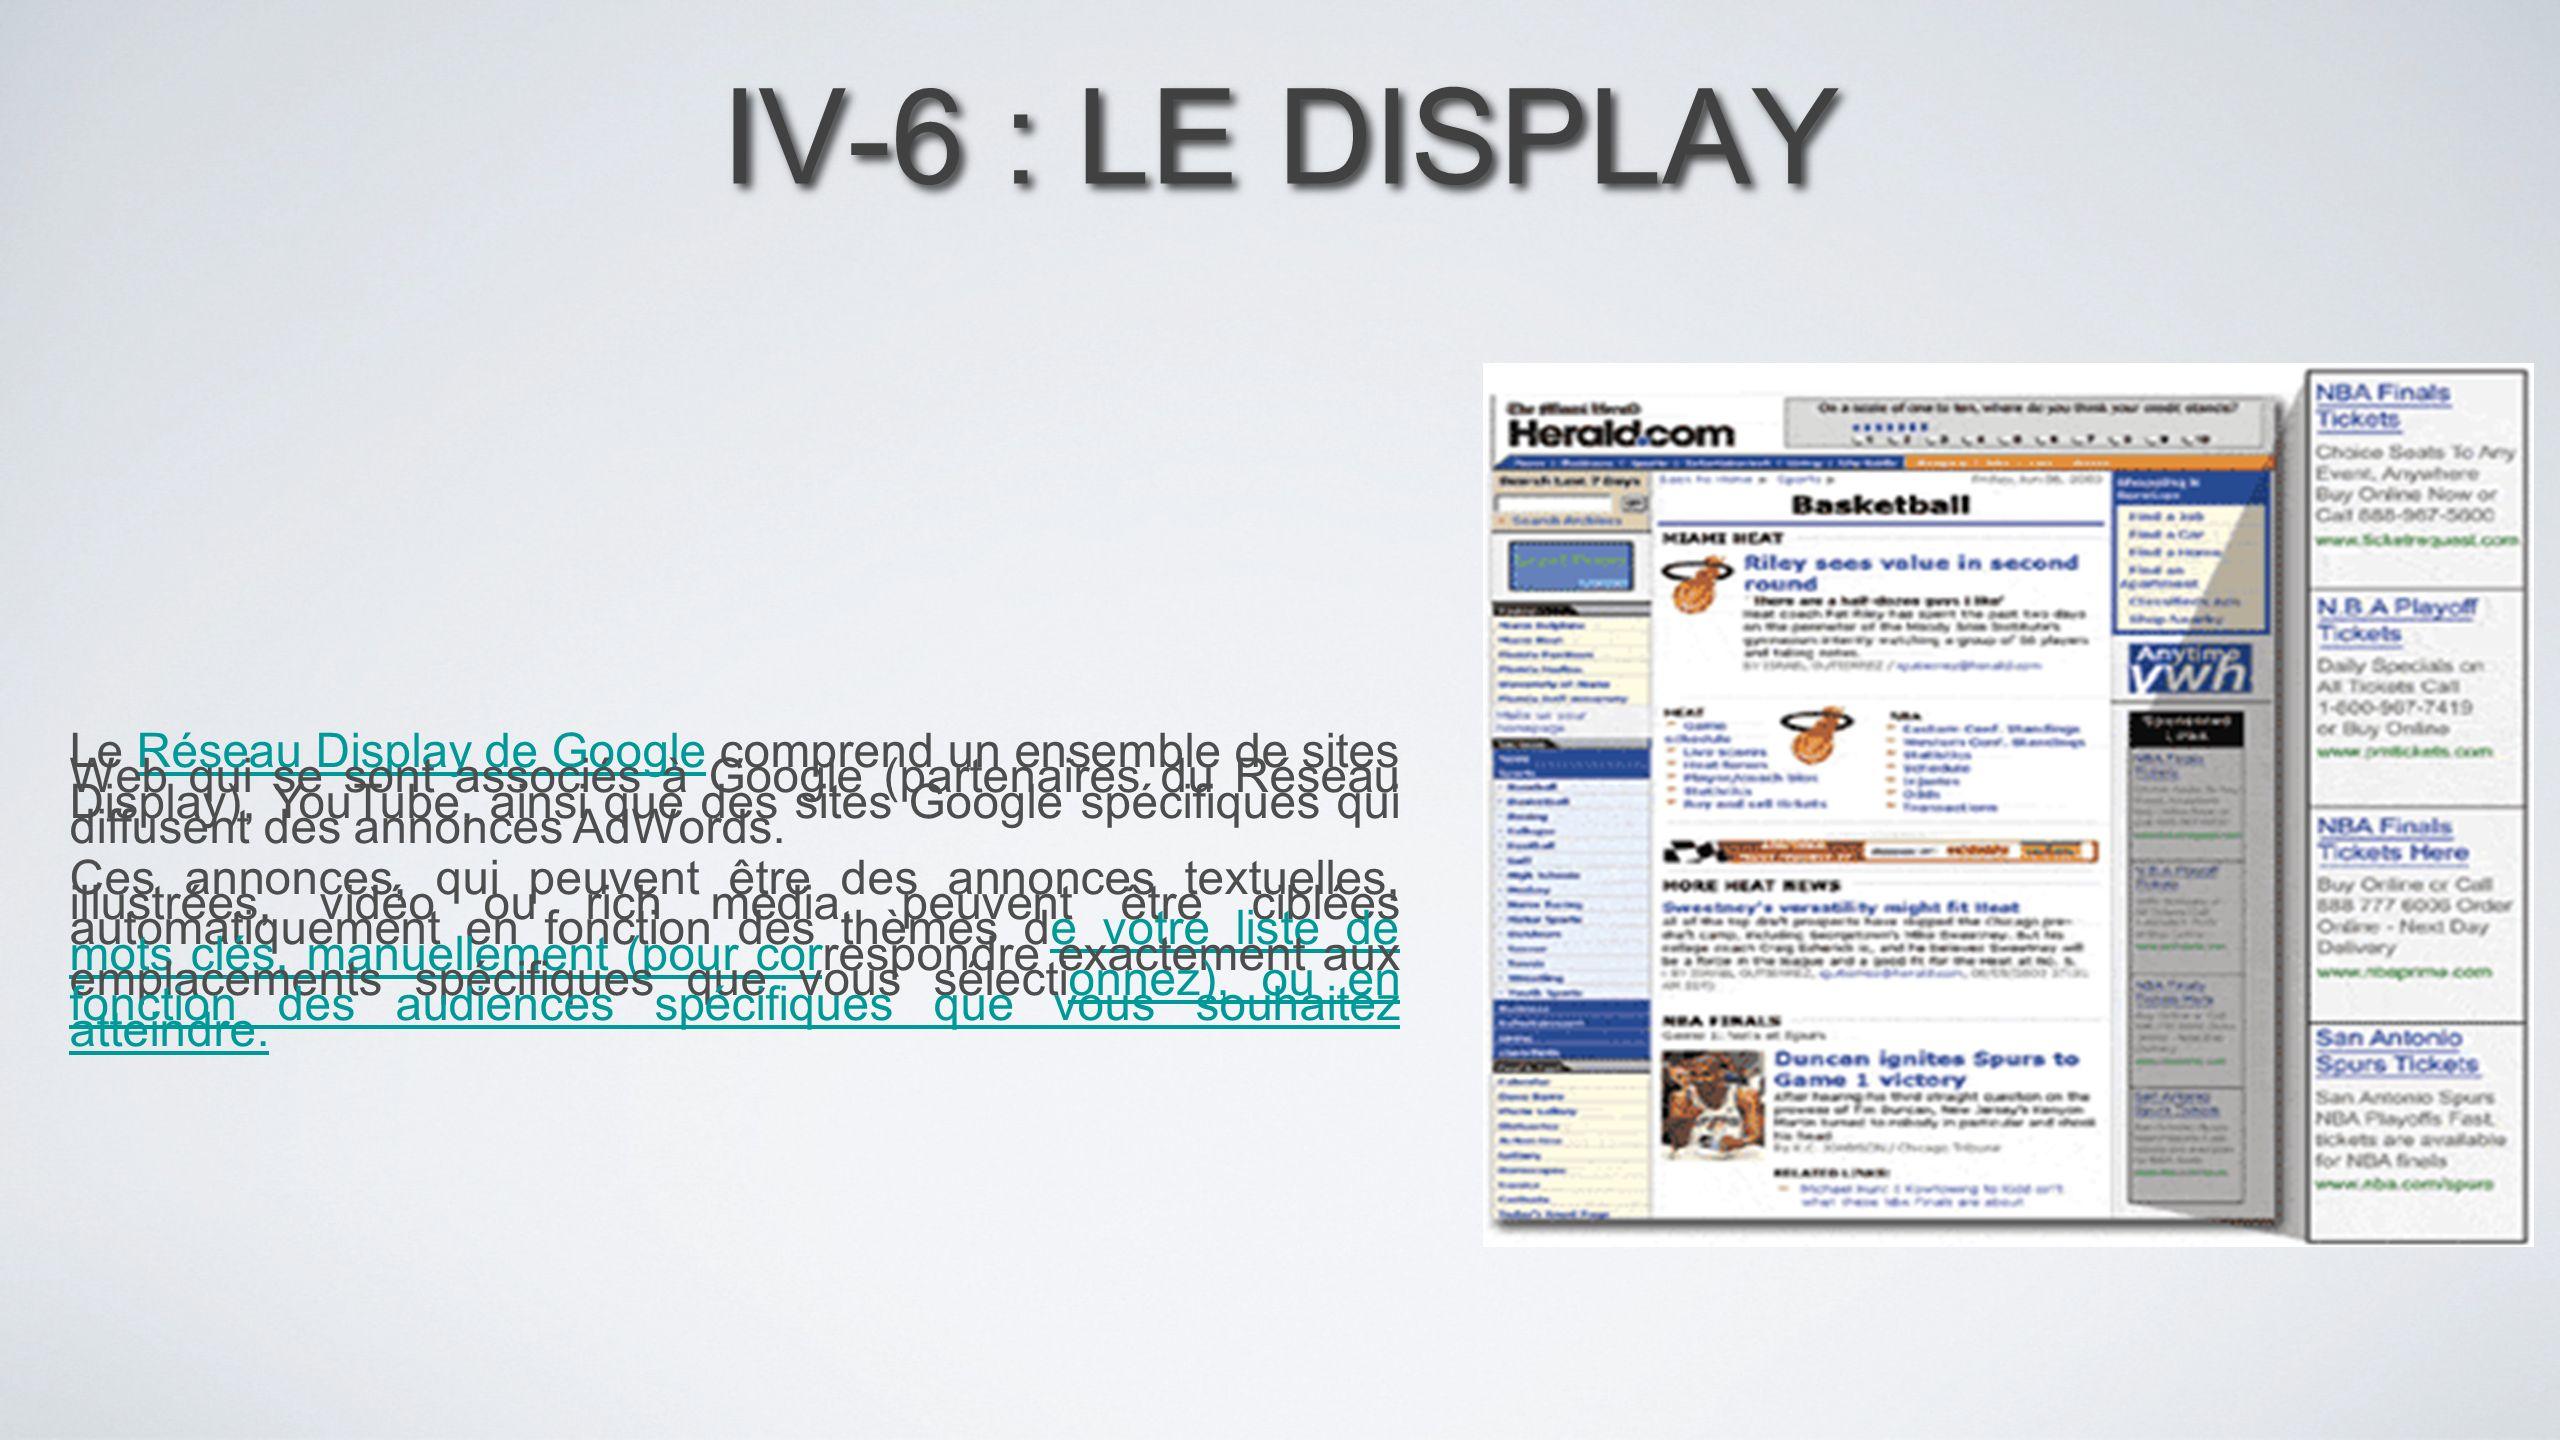 IV-6 : LE DISPLAY